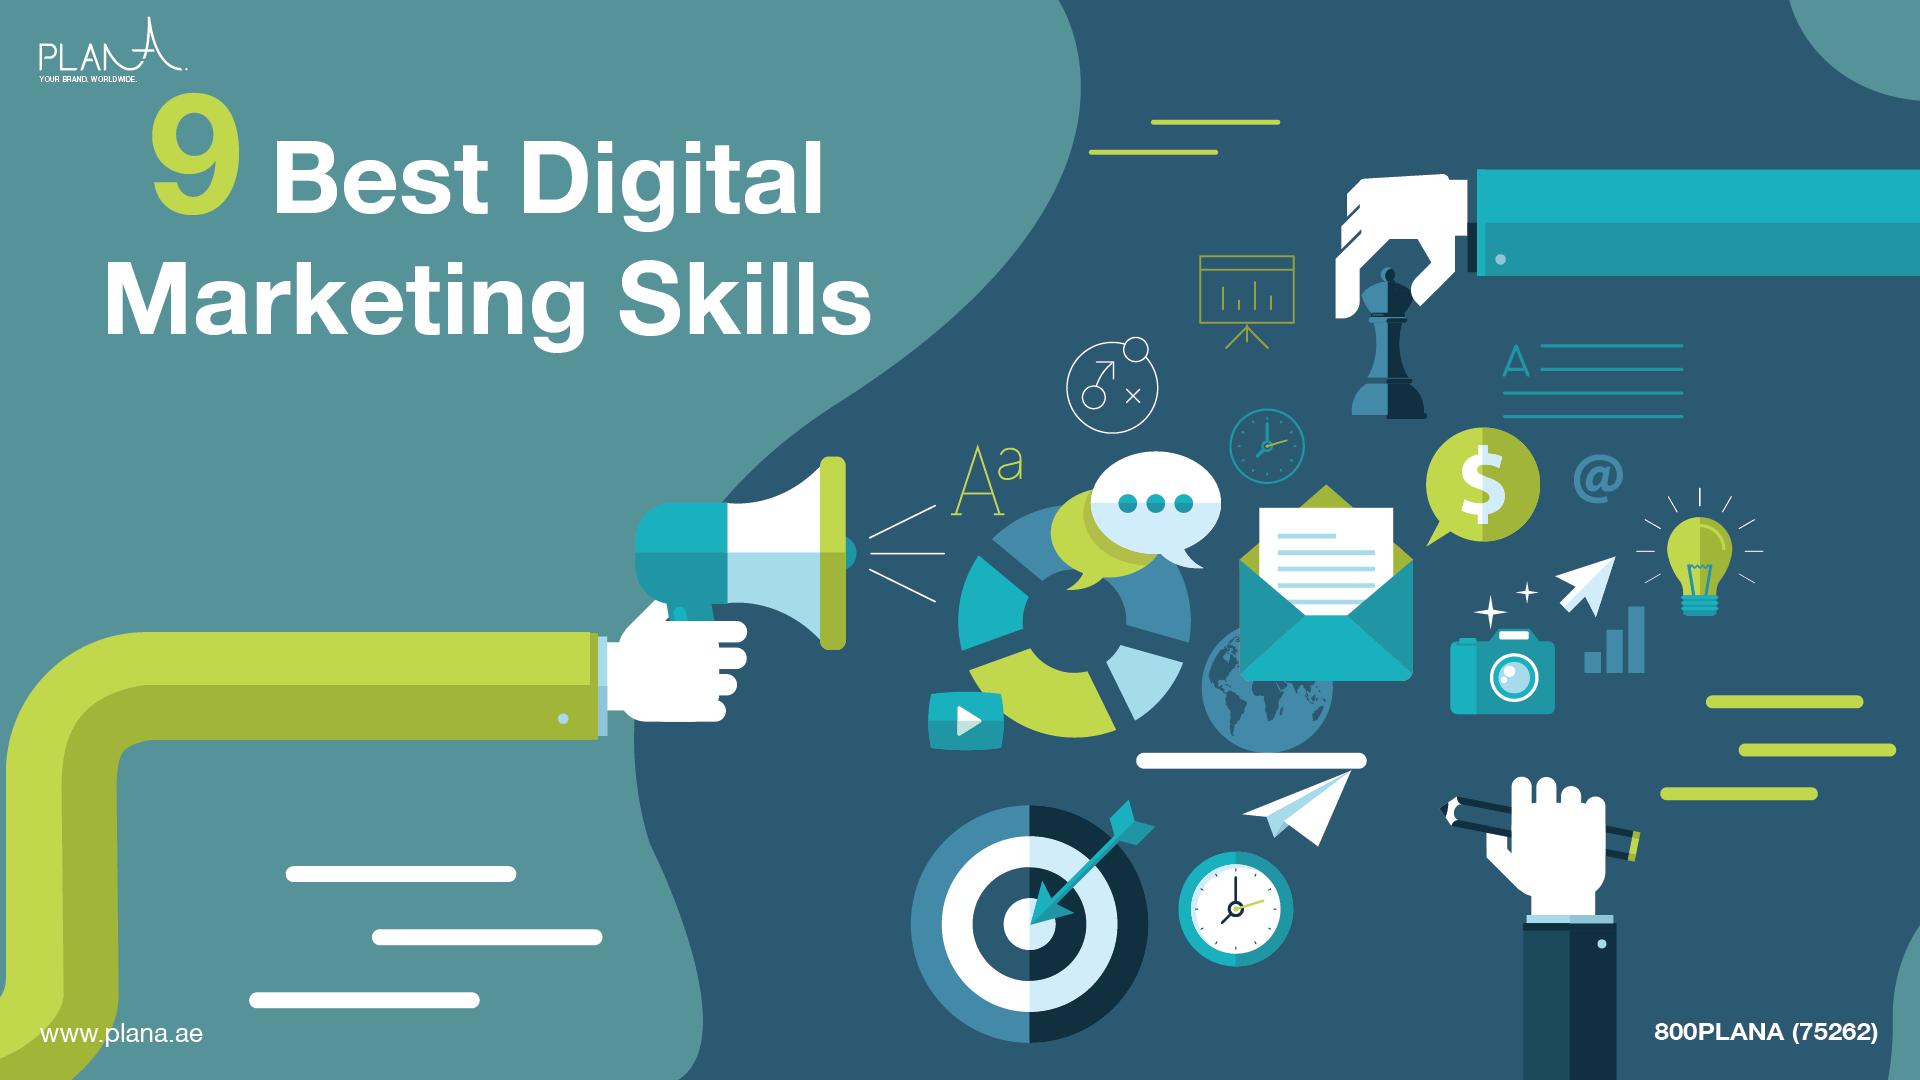 9 Best Digital Marketing Skills That Companies Look For